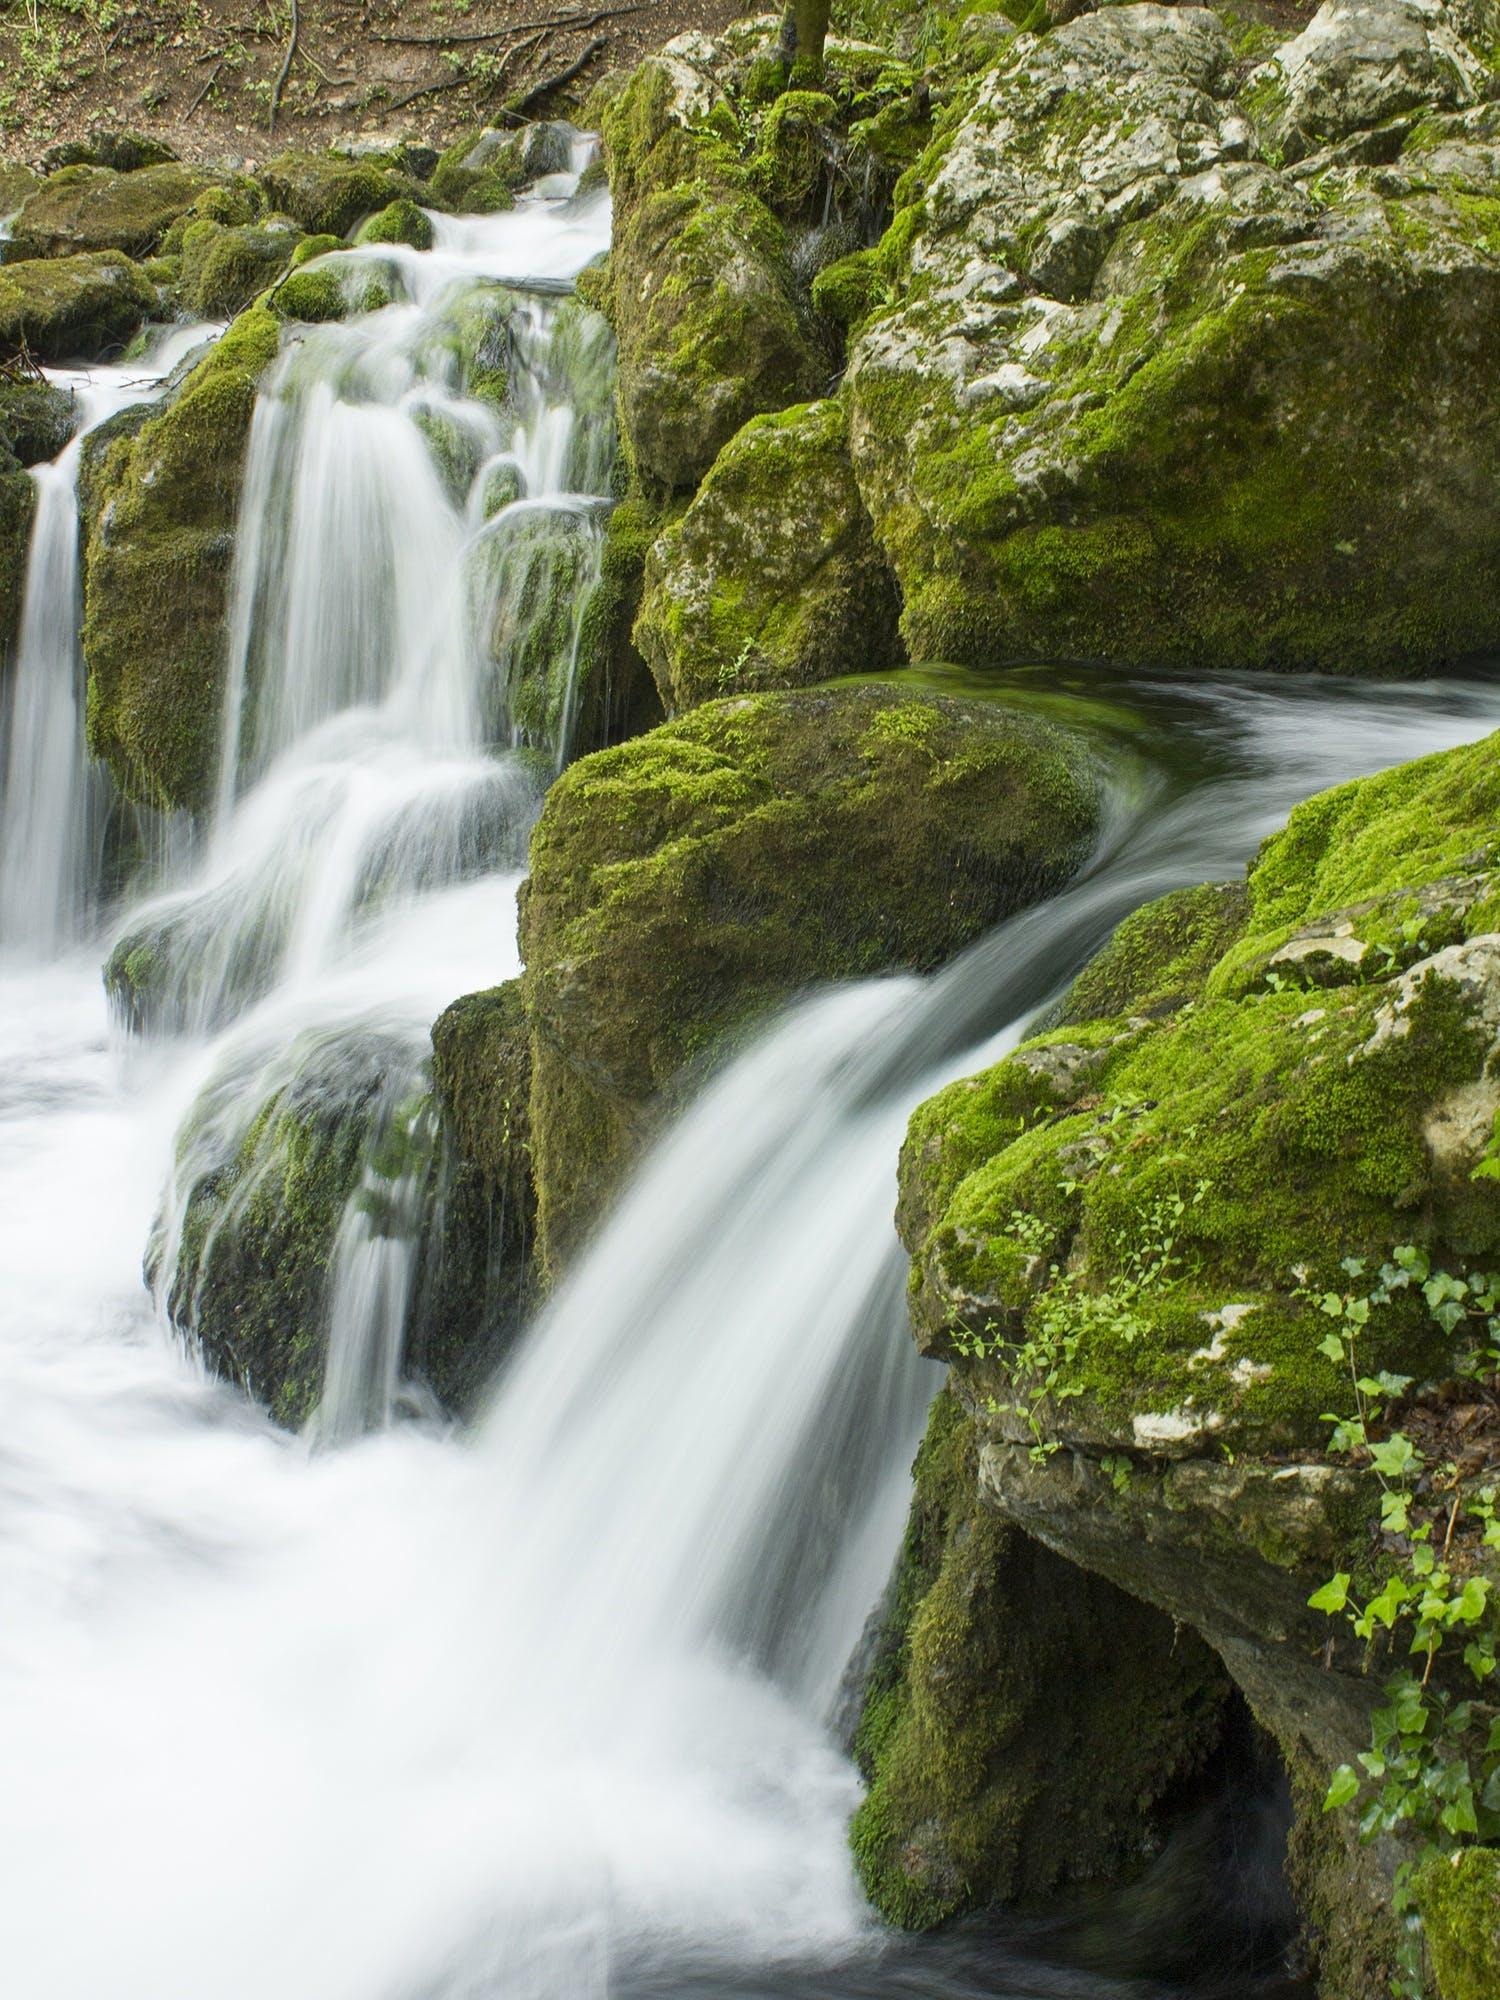 Waterfalls from Rocks